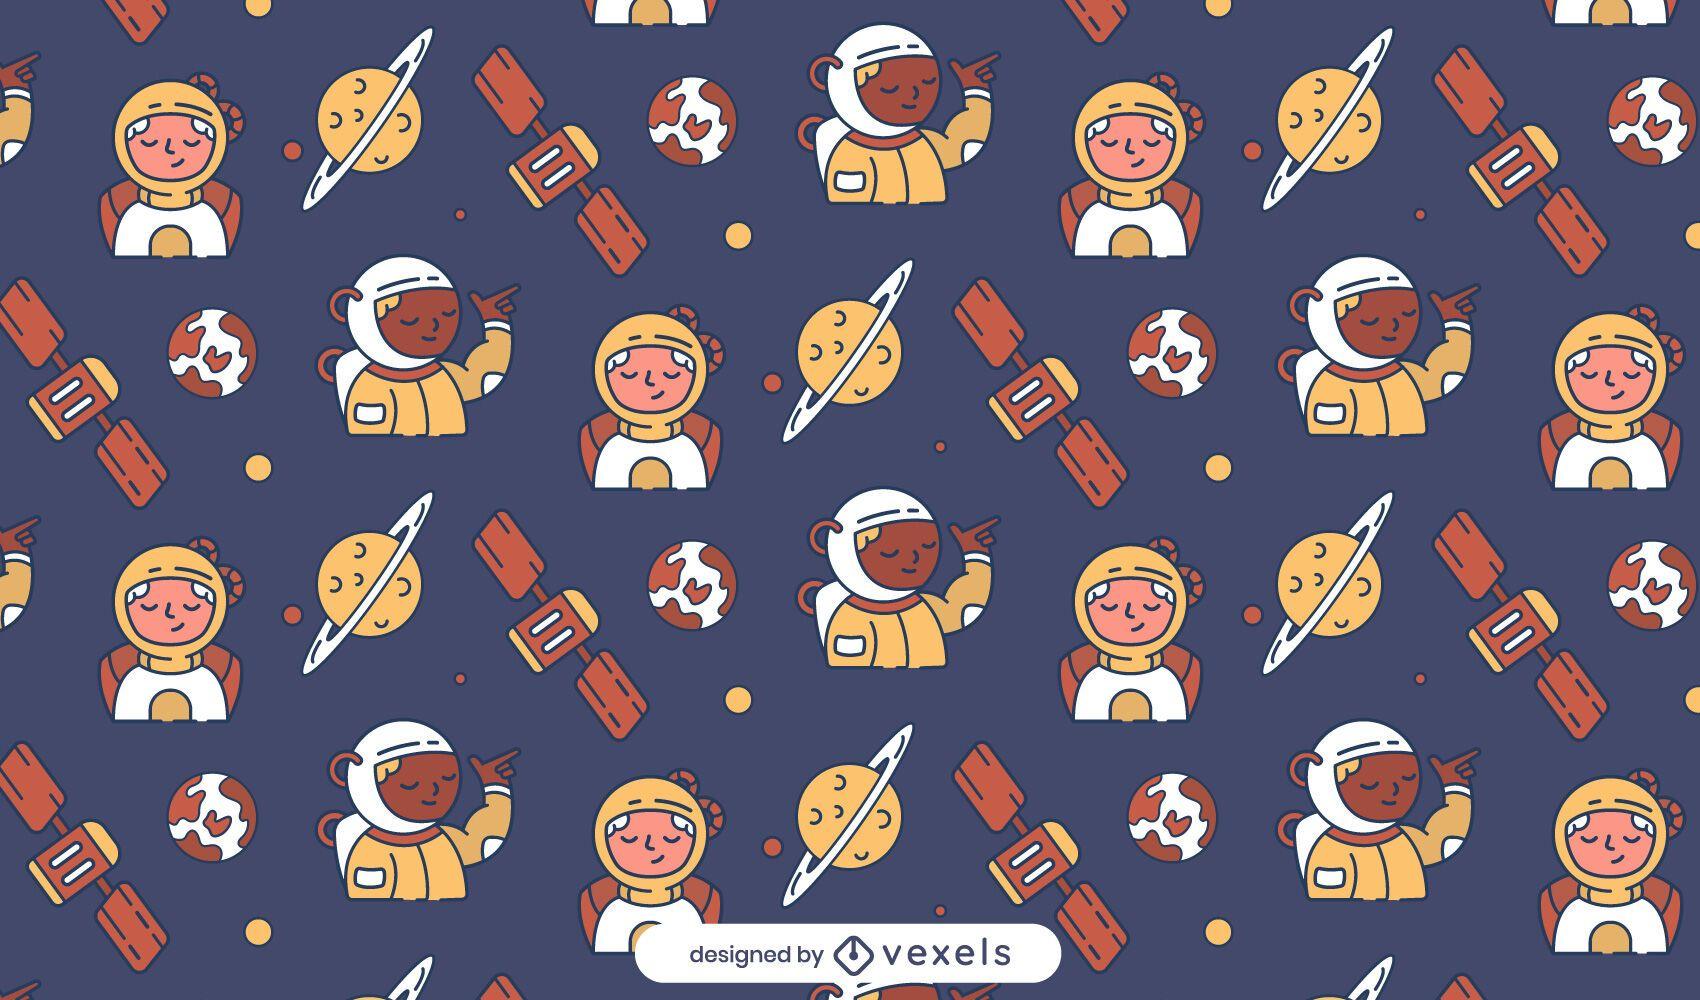 Diseño de patrón de planetas astronautas